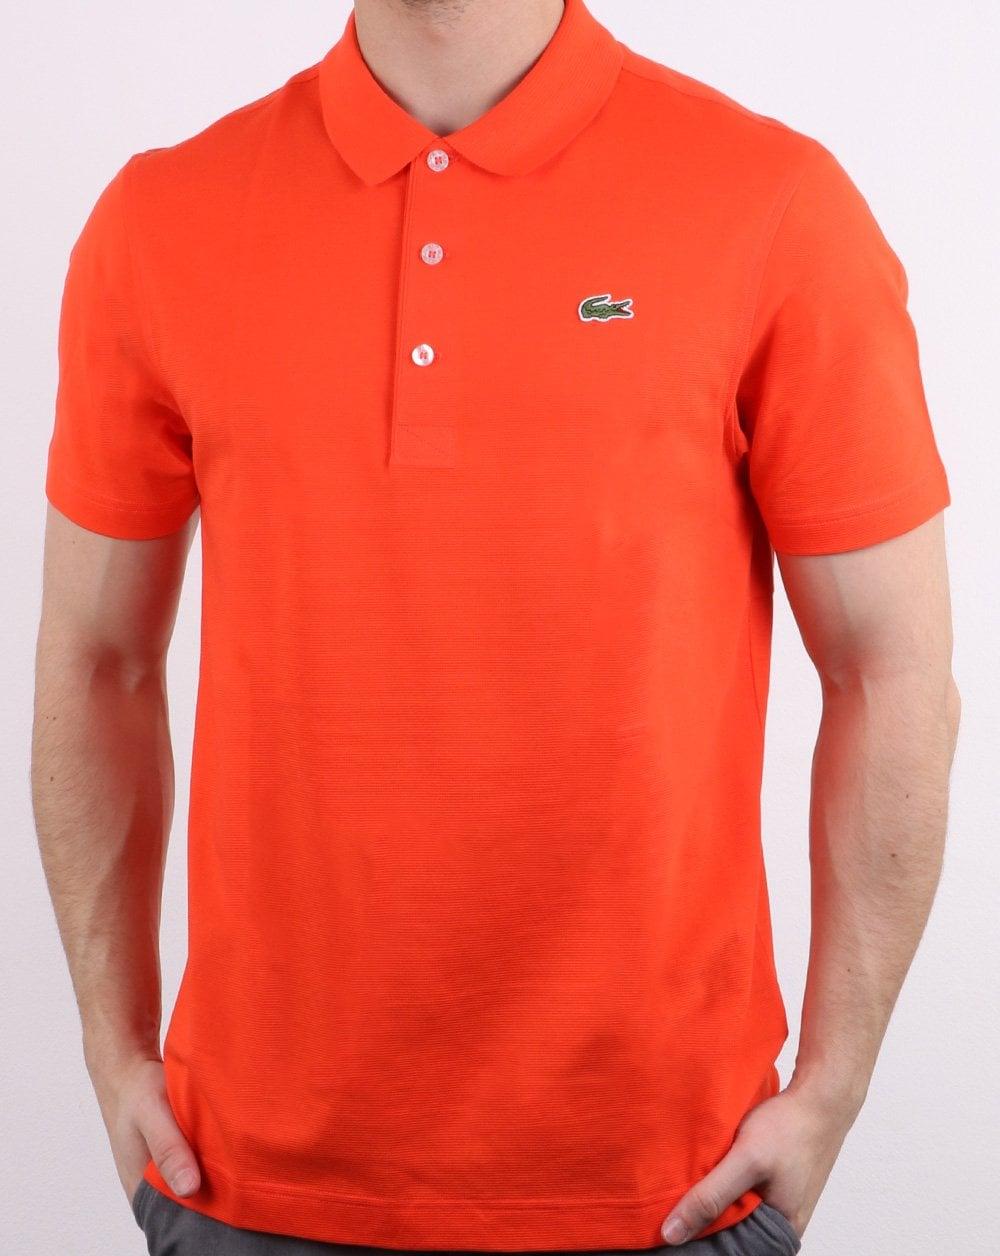 2696f929 Lacoste Polo Shirt Orange